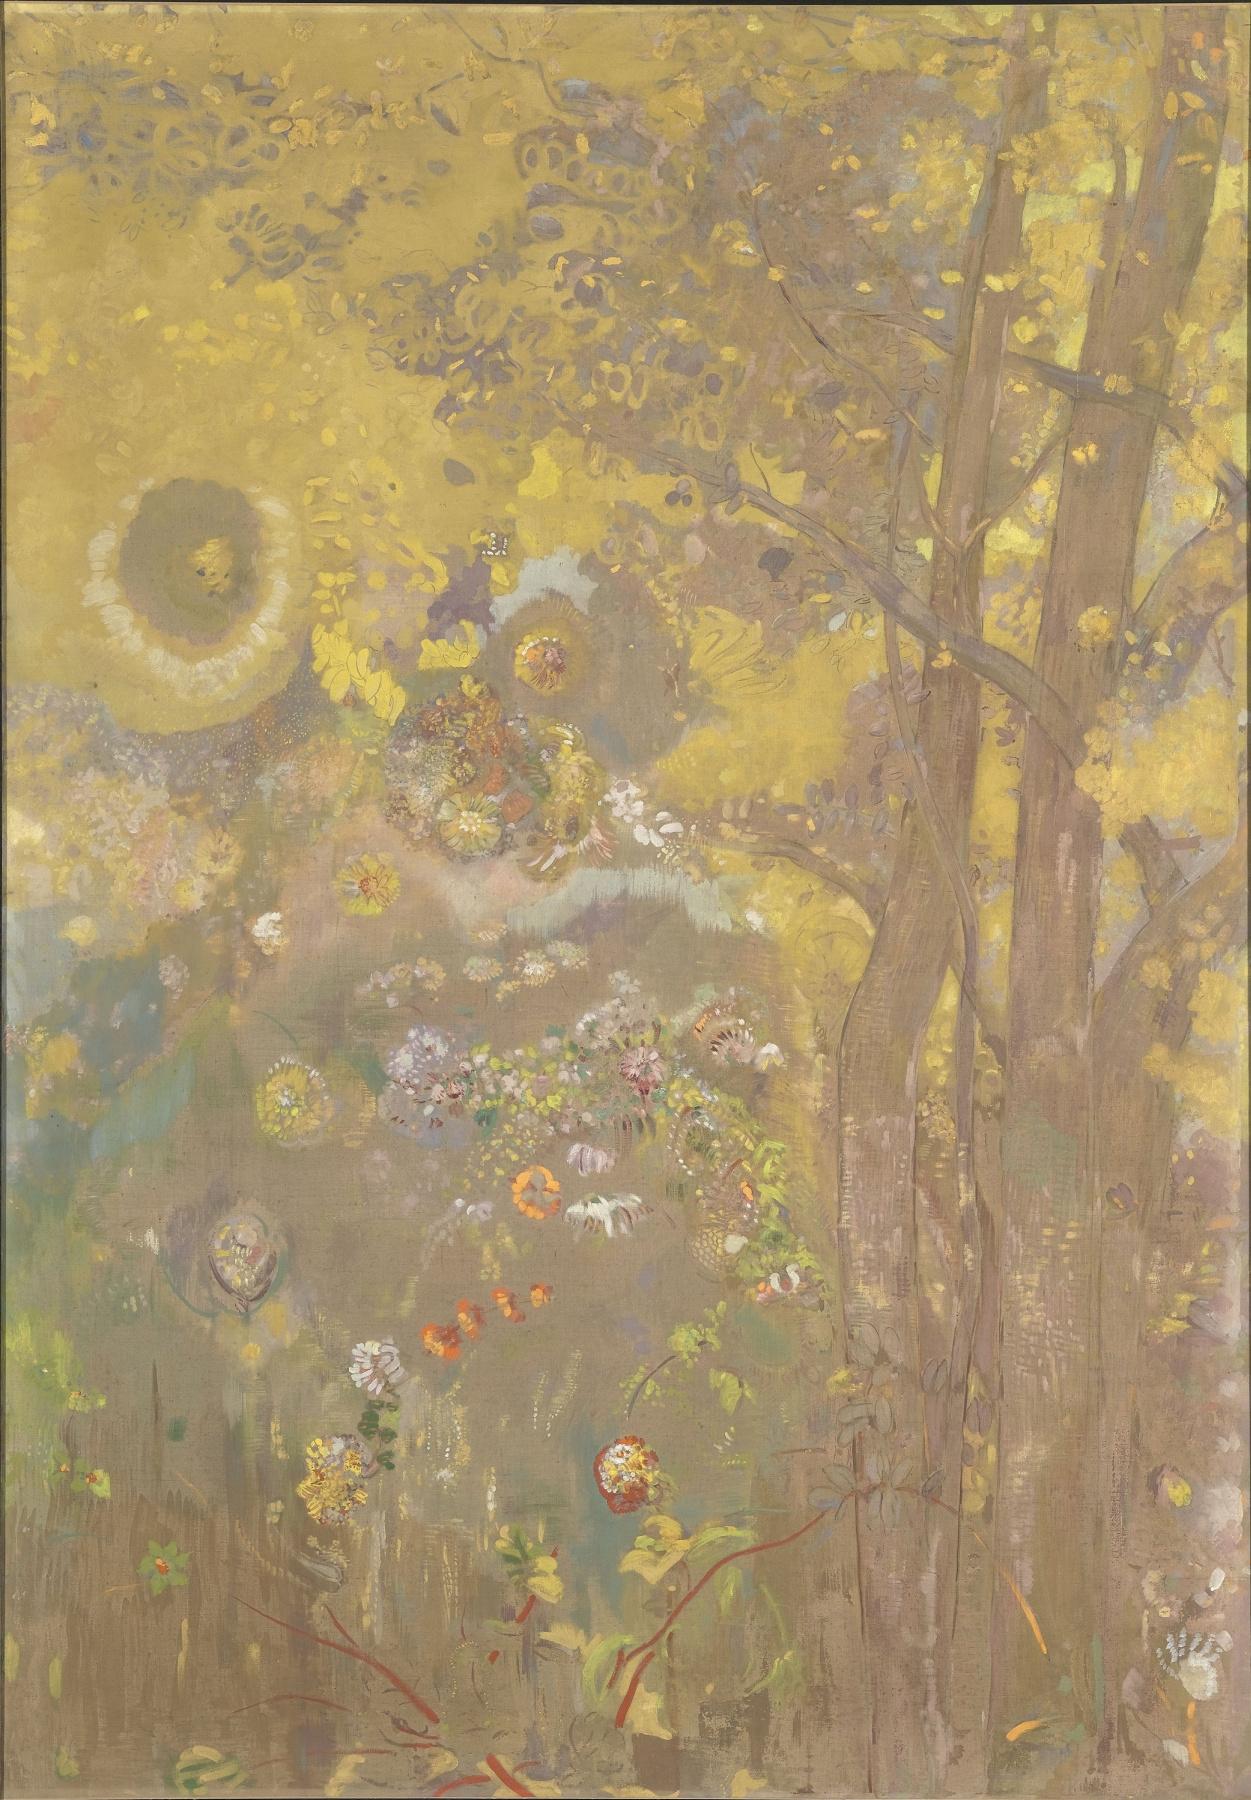 Odilon Redon. Trees on a yellow background